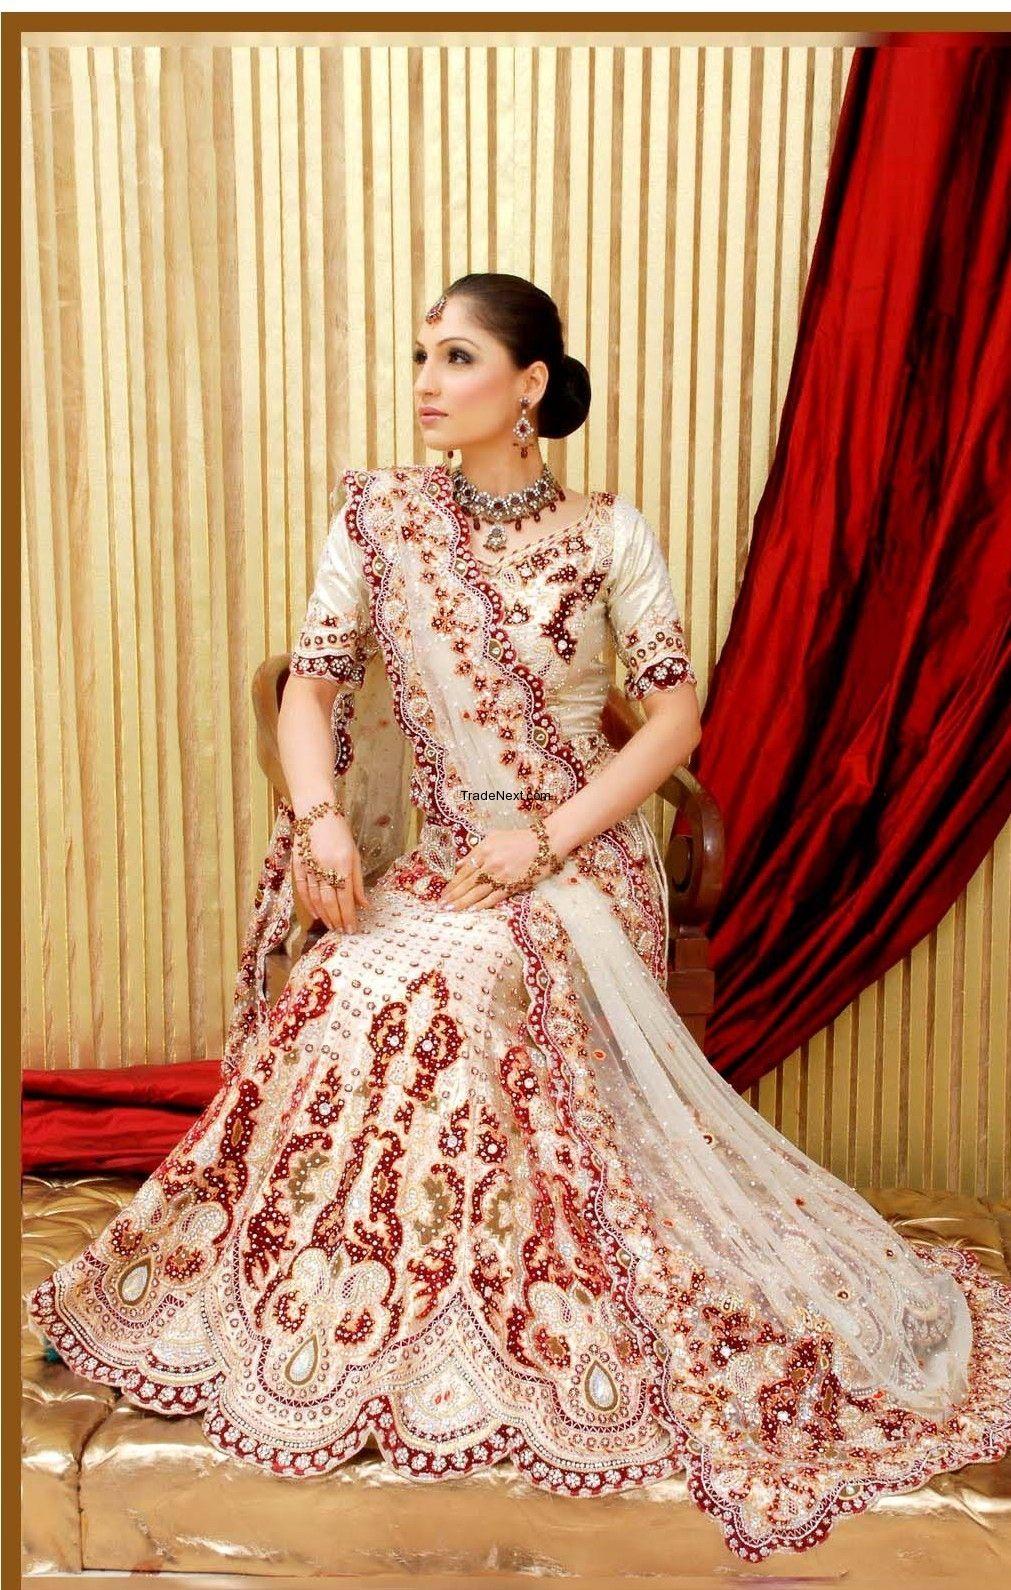 pakistani wedding dresses Pakistani Wedding Dresses pakistani bridal dresses free photos